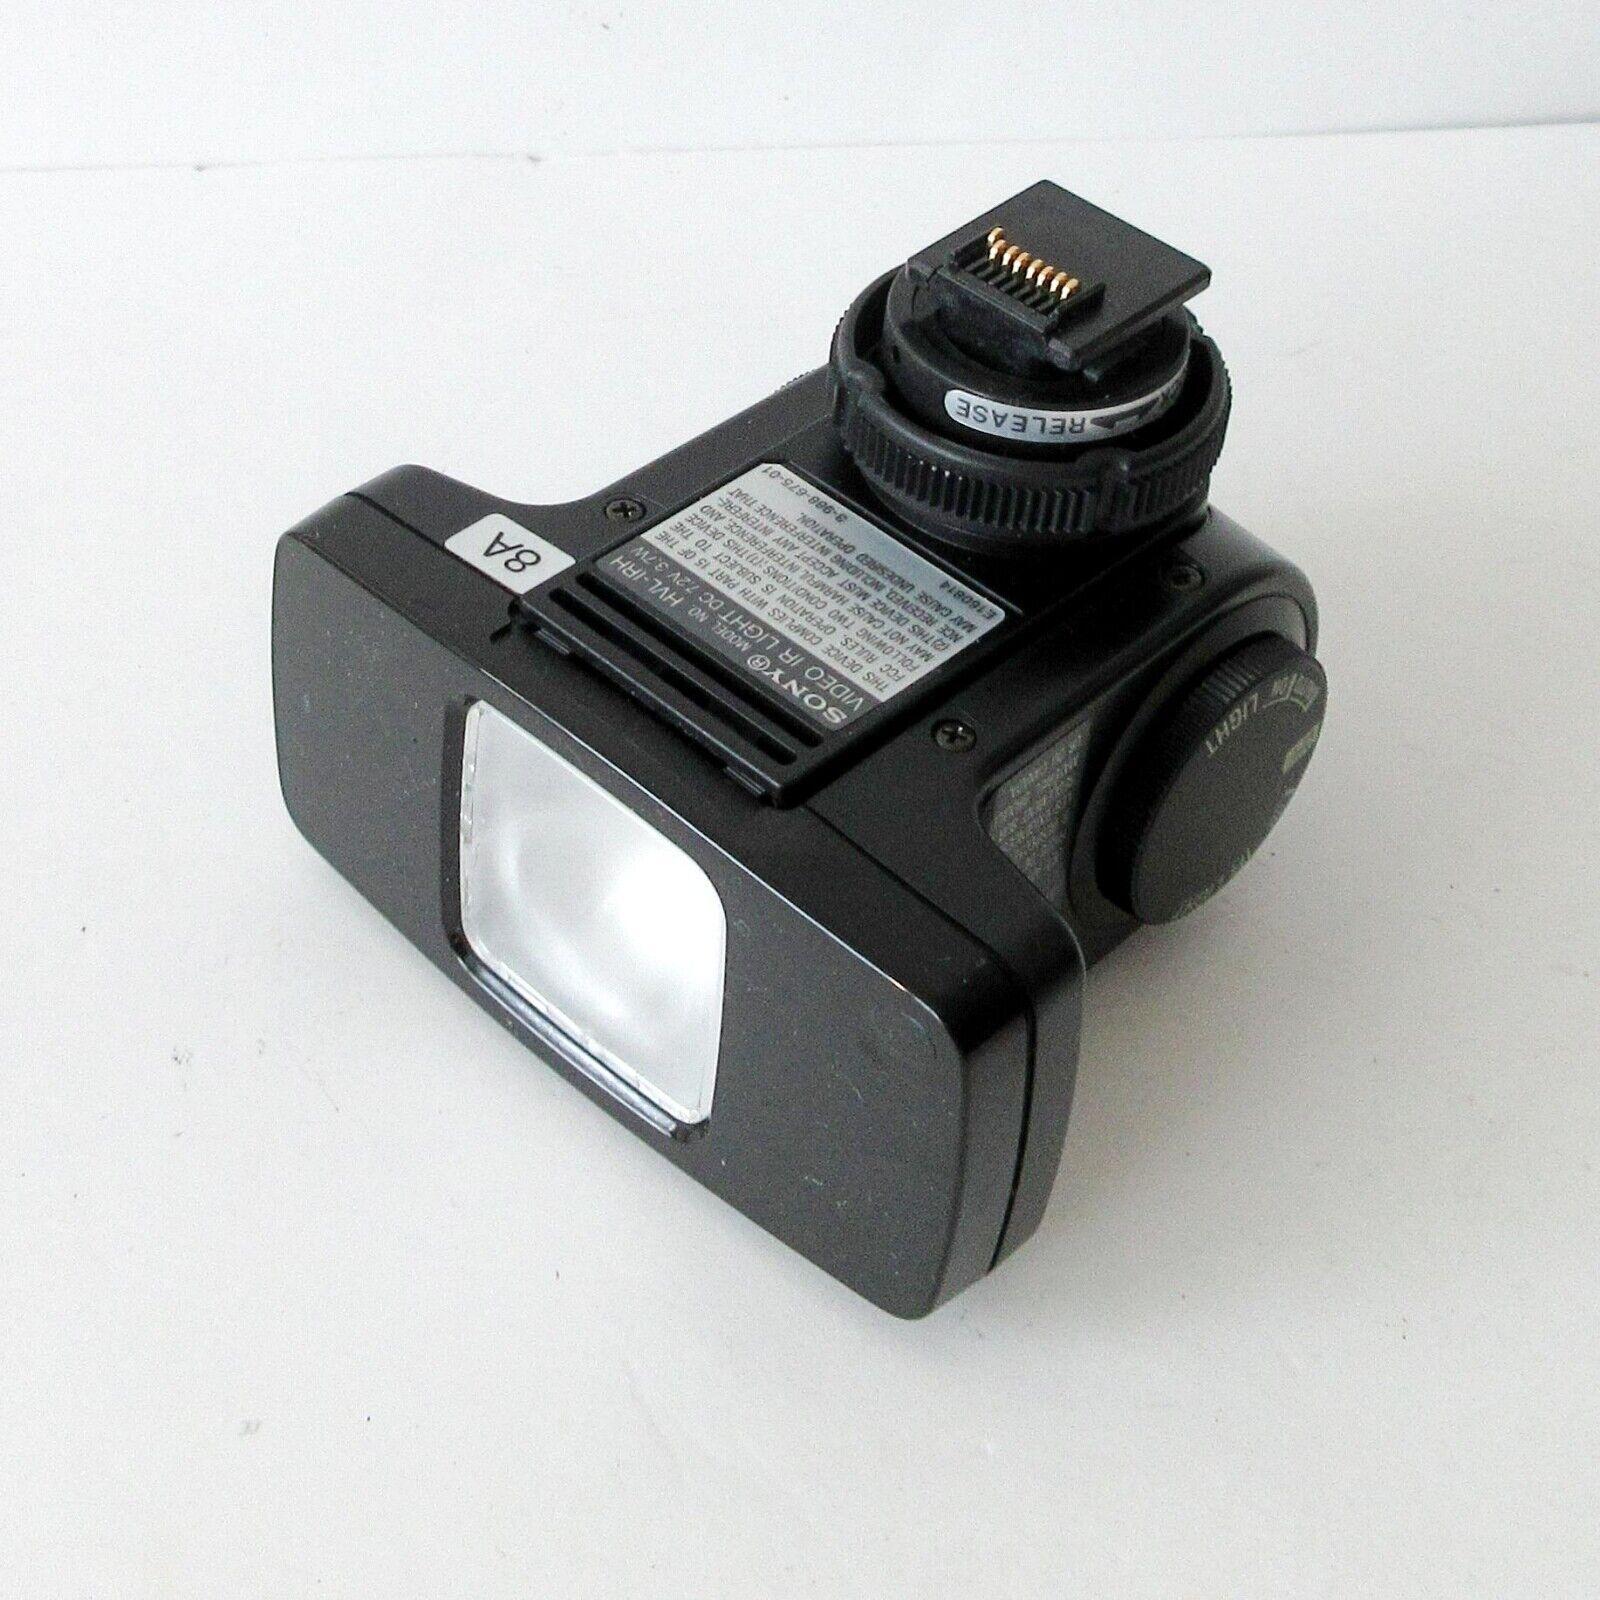 SONY HVL-IRH Video IR Light NightShot Infrared Light Handycam Flash Module #058